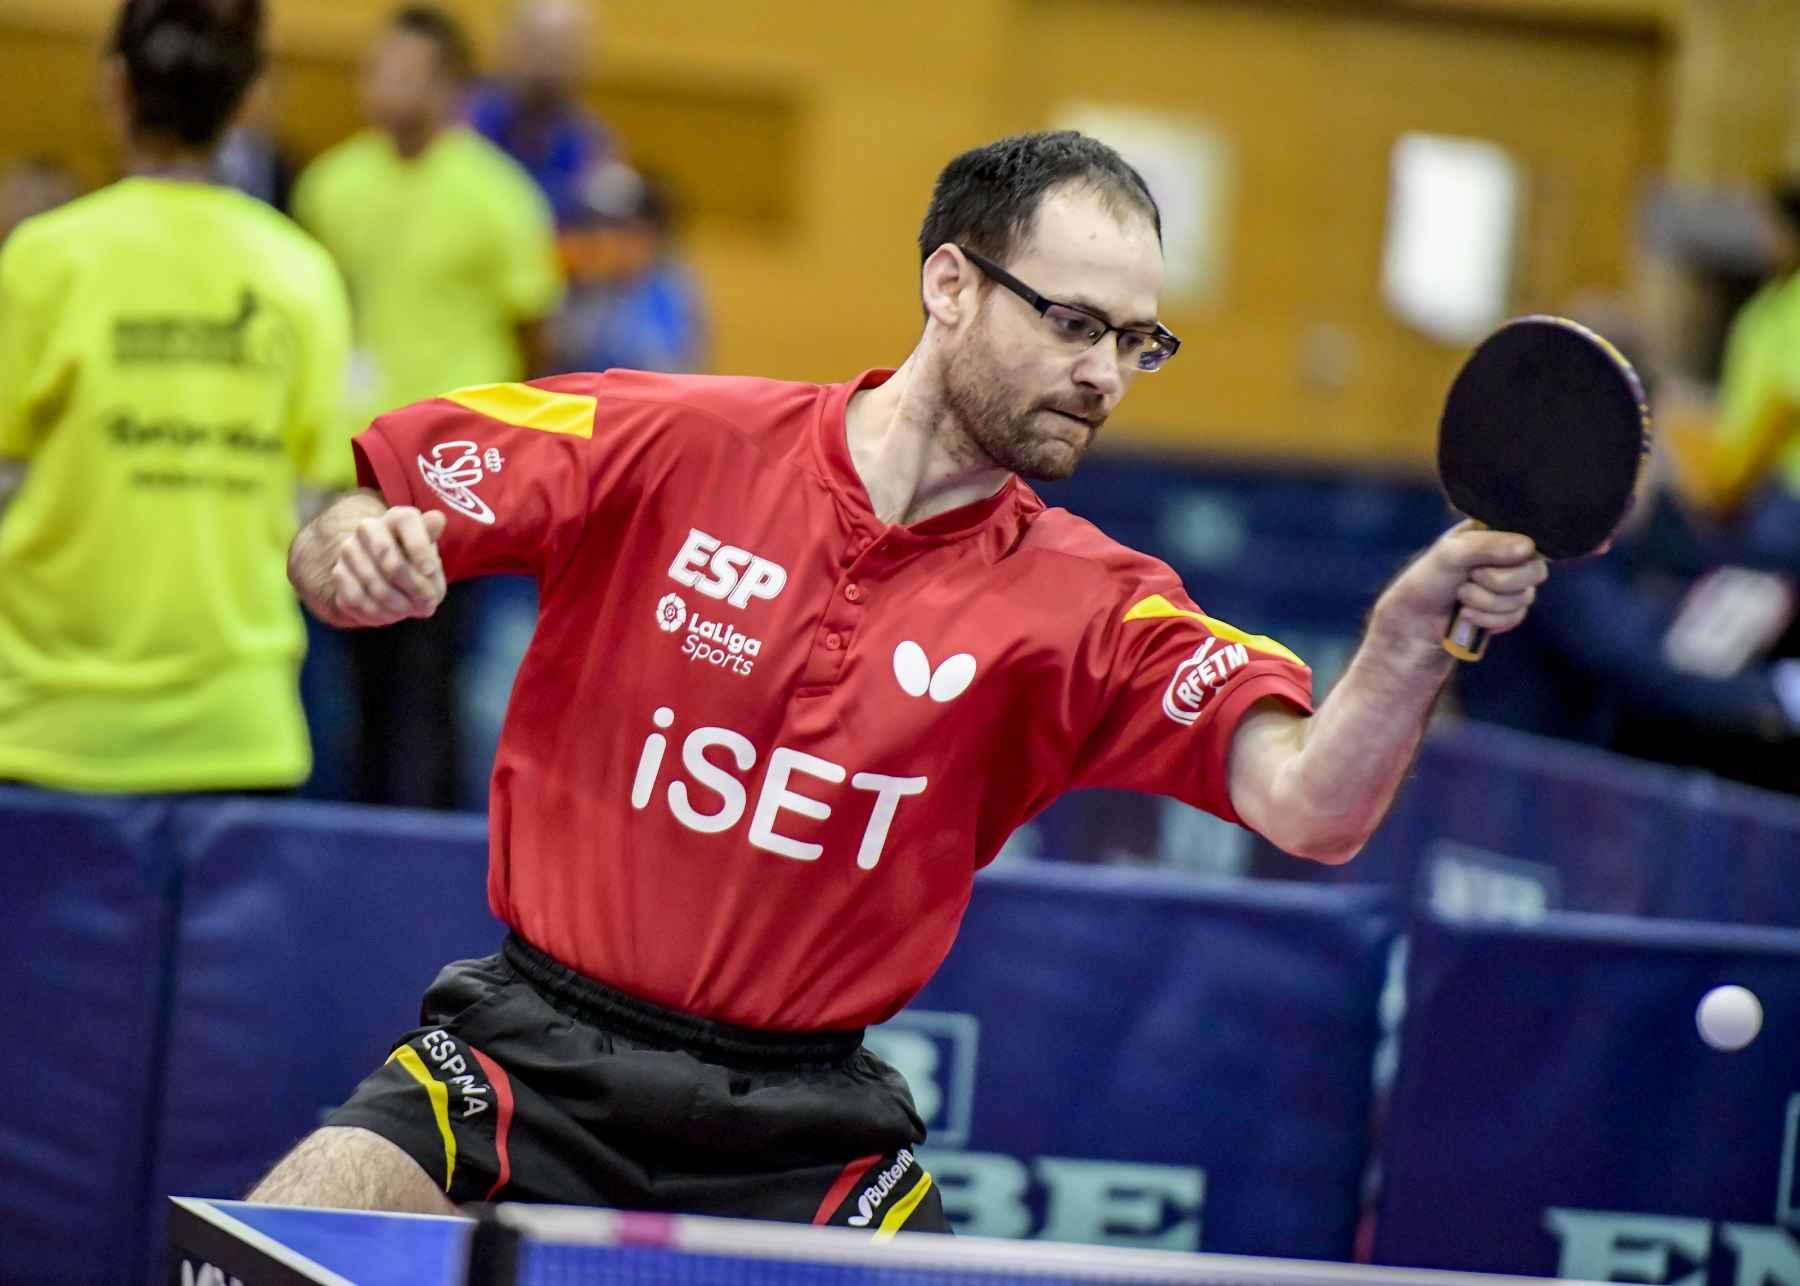 Eduardo Cuesta disputando el PTT Spanish Open 2020